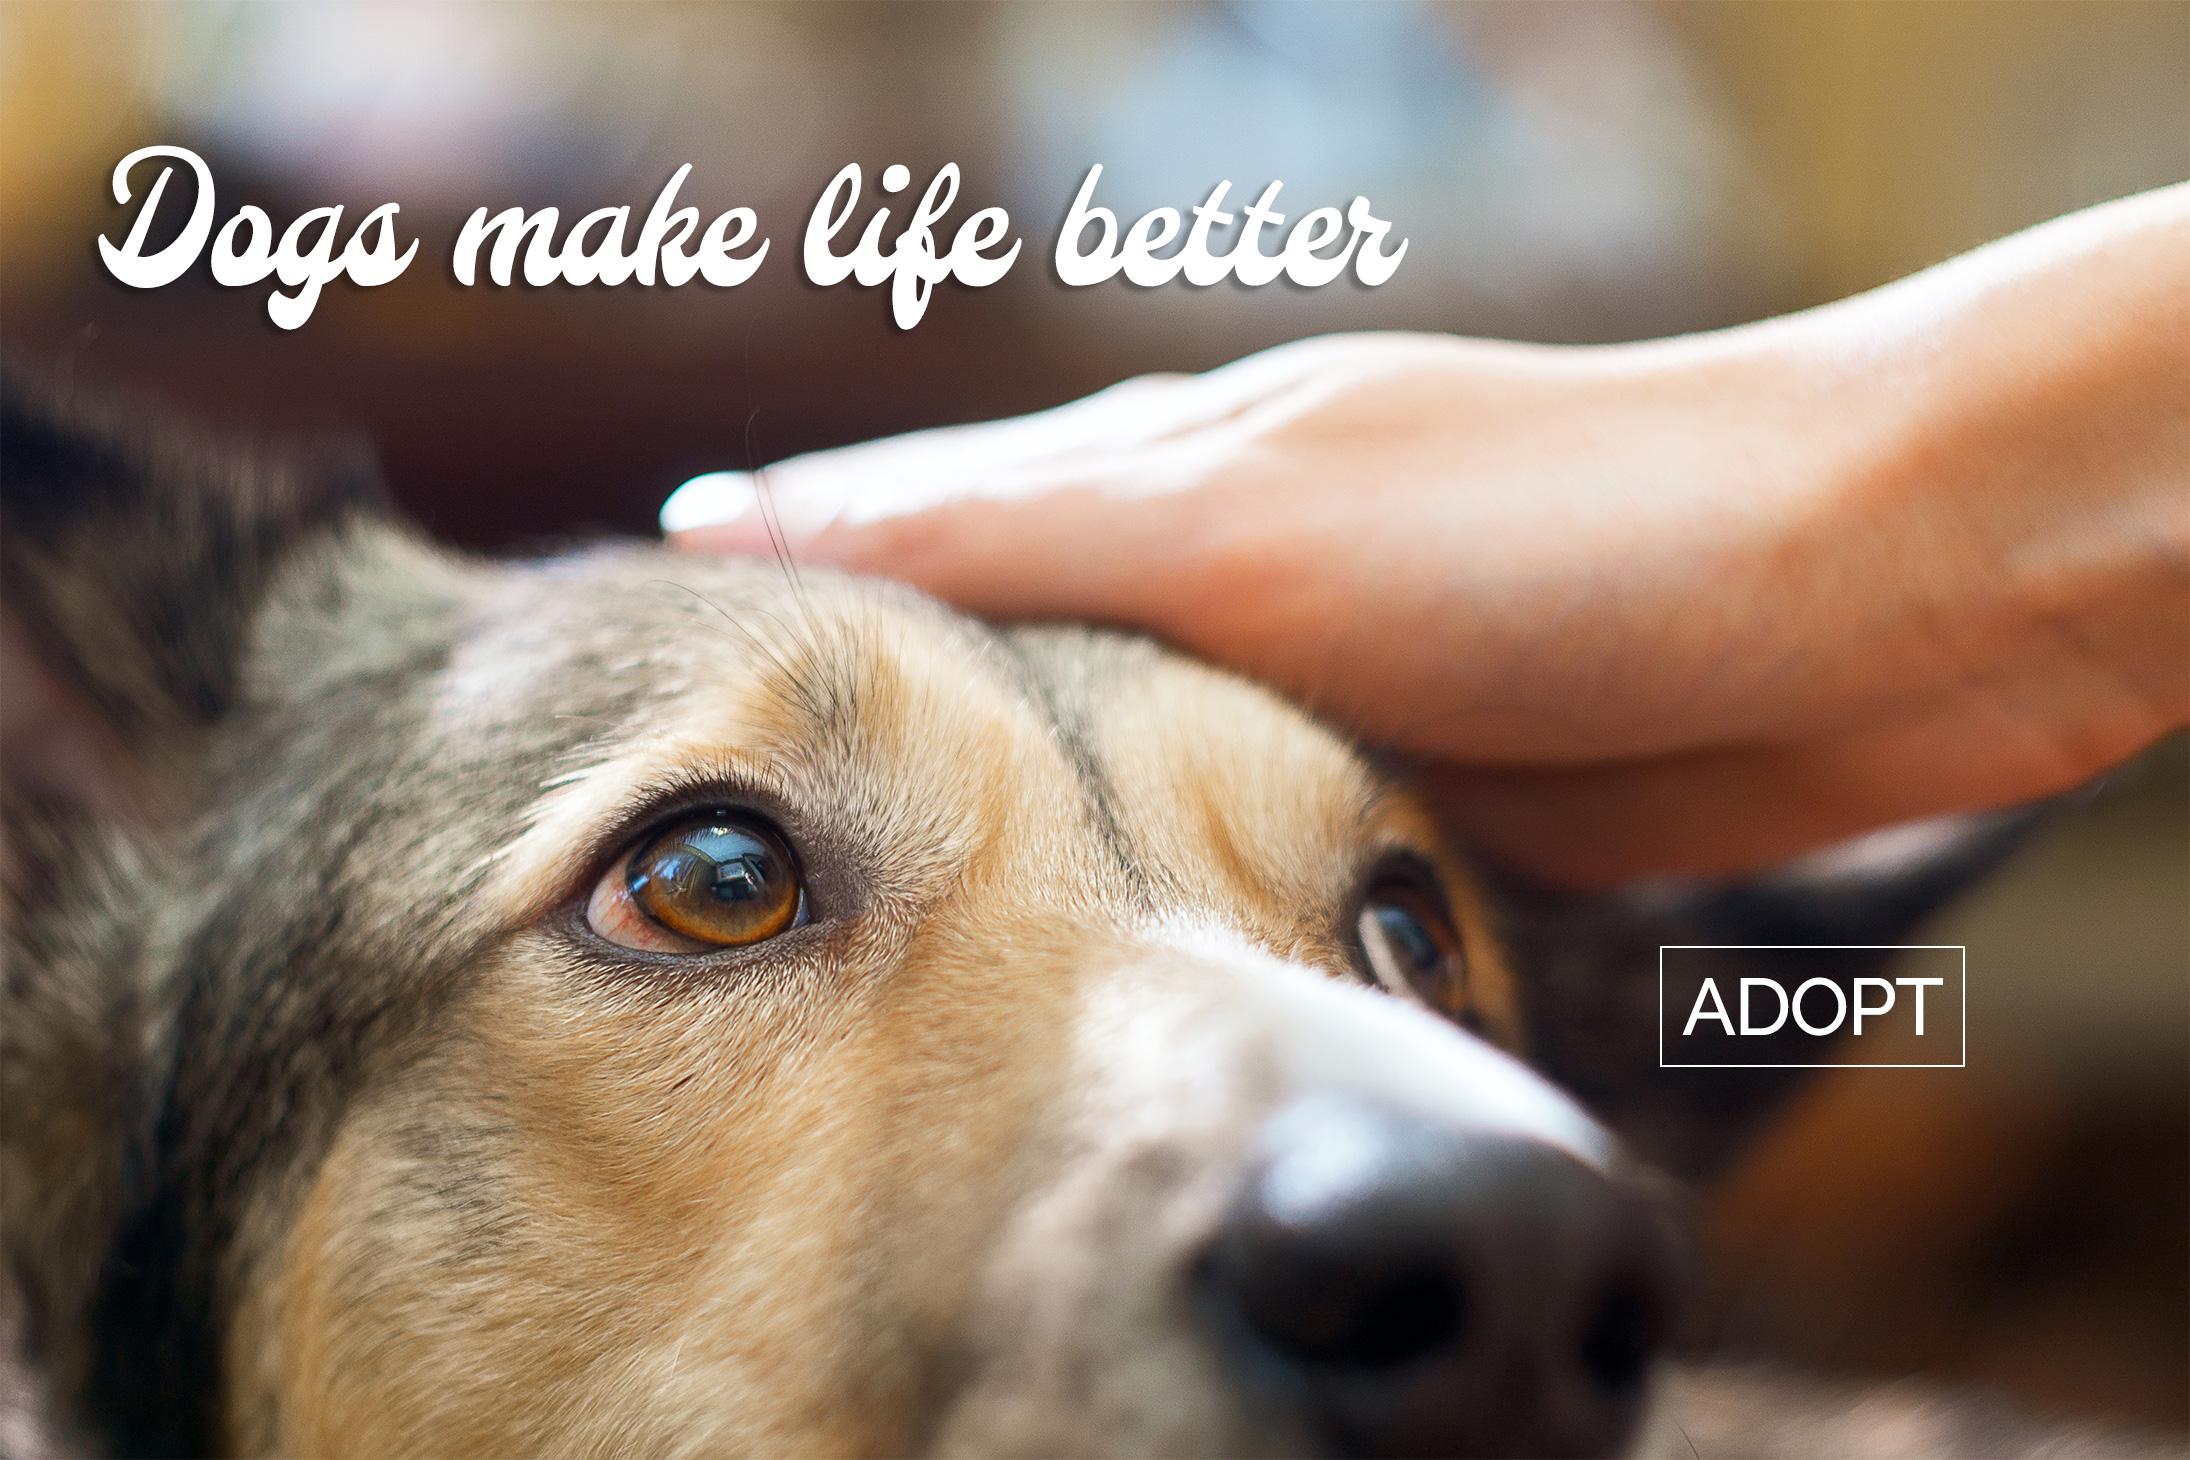 Dogs make life better - Adopt